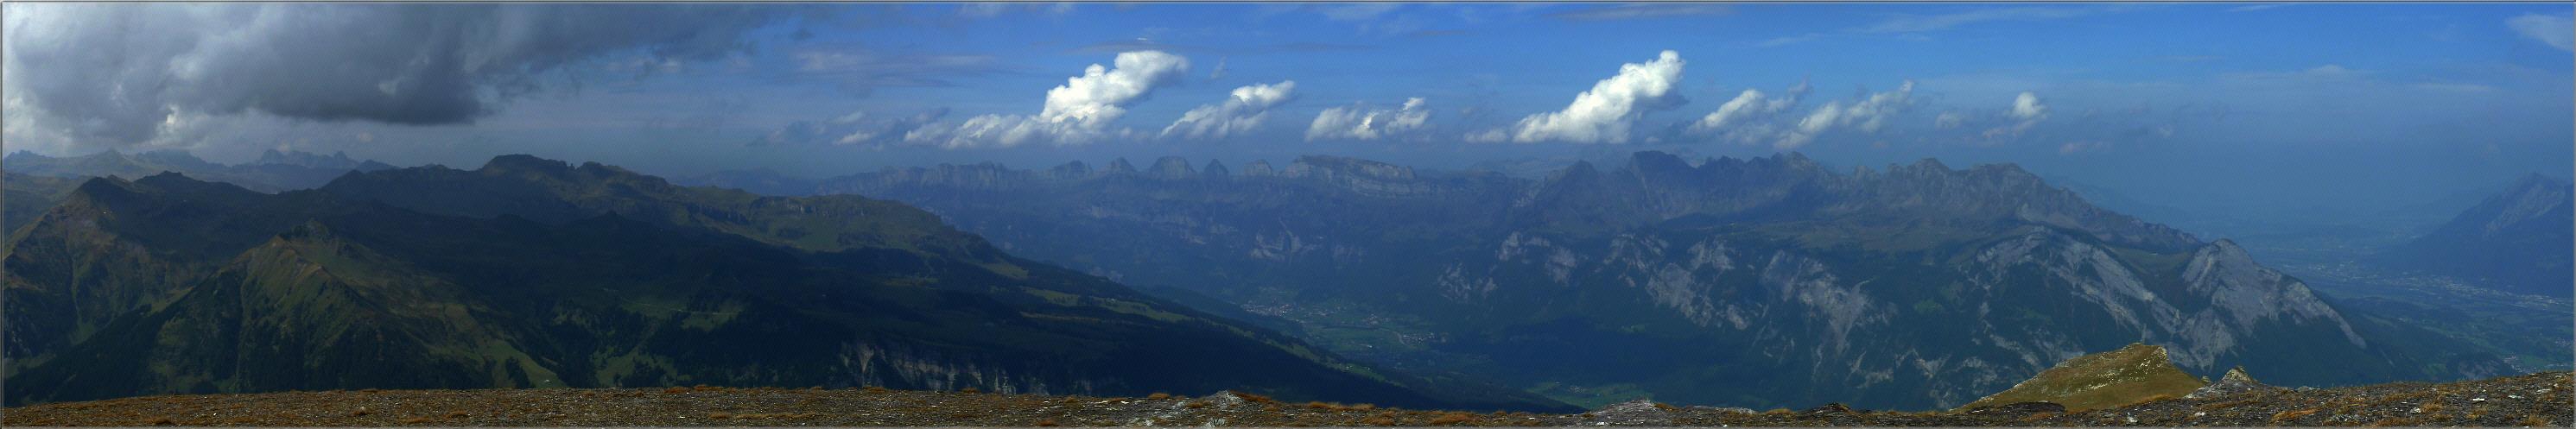 5 Seen Wanderung Panorama vom Schwarzplangg